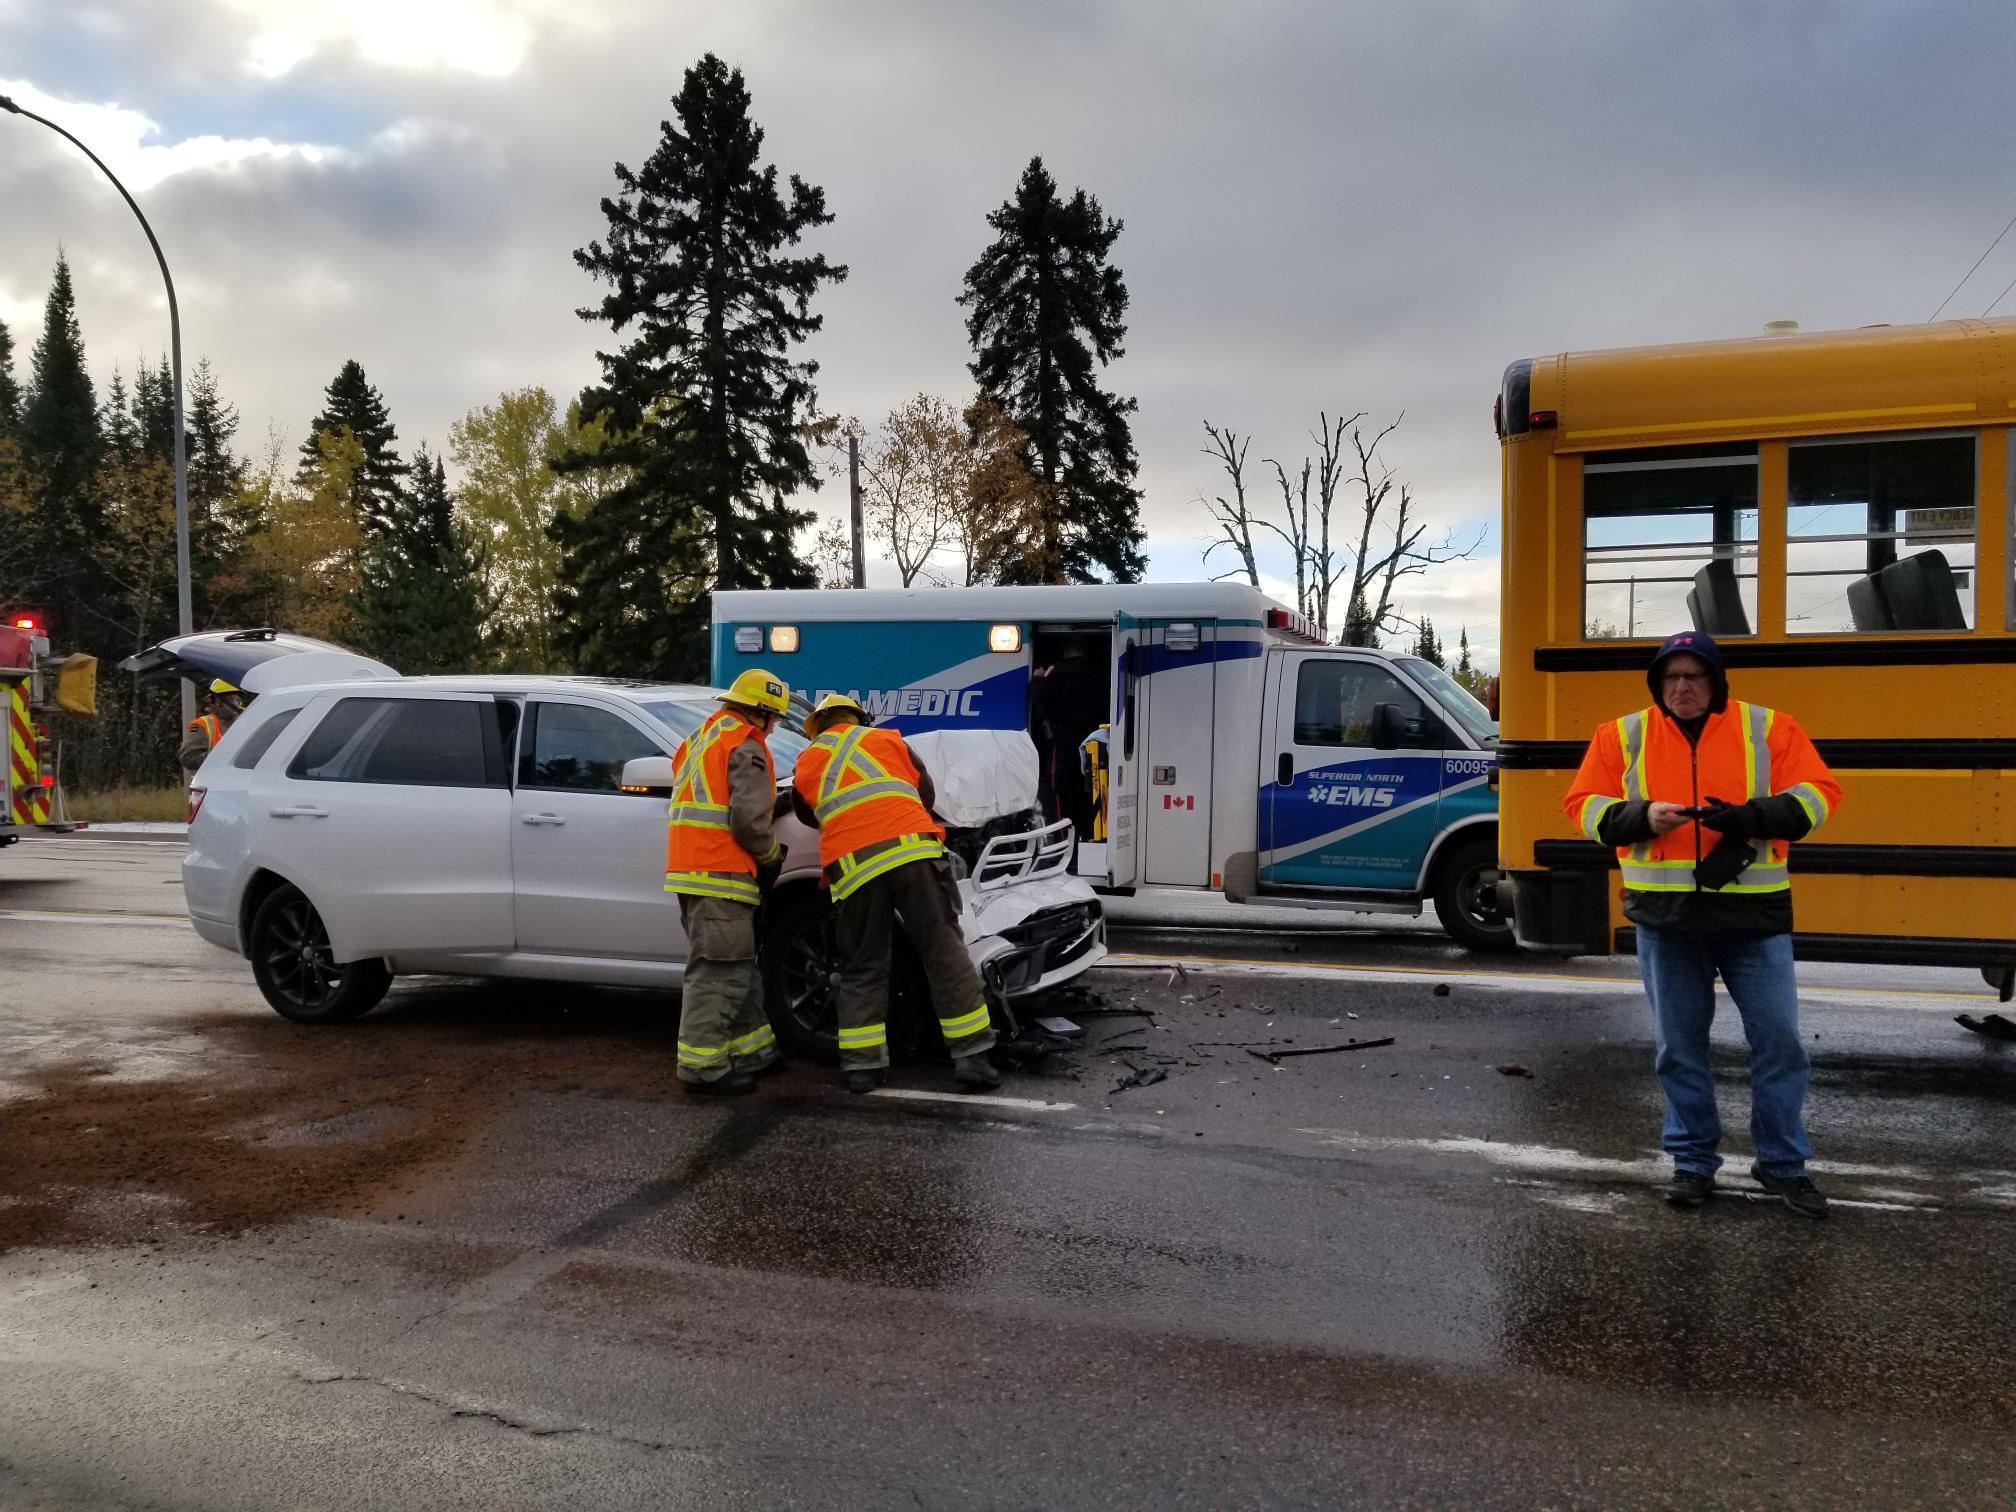 Minor Injuries In Bus Crash